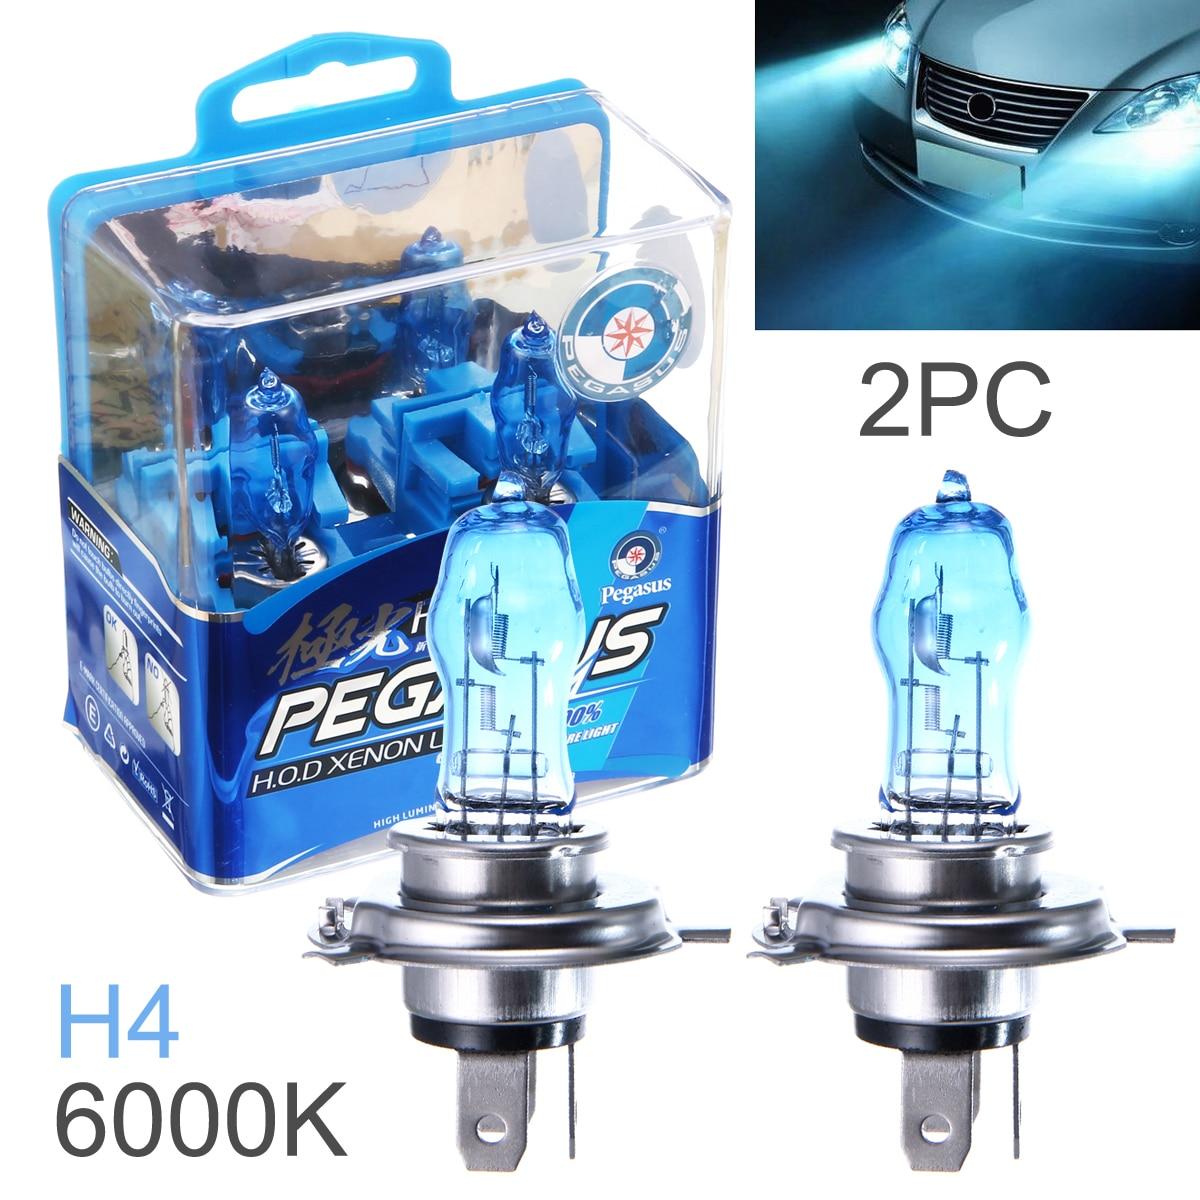 2 Pcs DC 12V H4 100W 6000K White Light Super Bright Car HOD Halogen Bulbs Auto Front Headlight Lamp